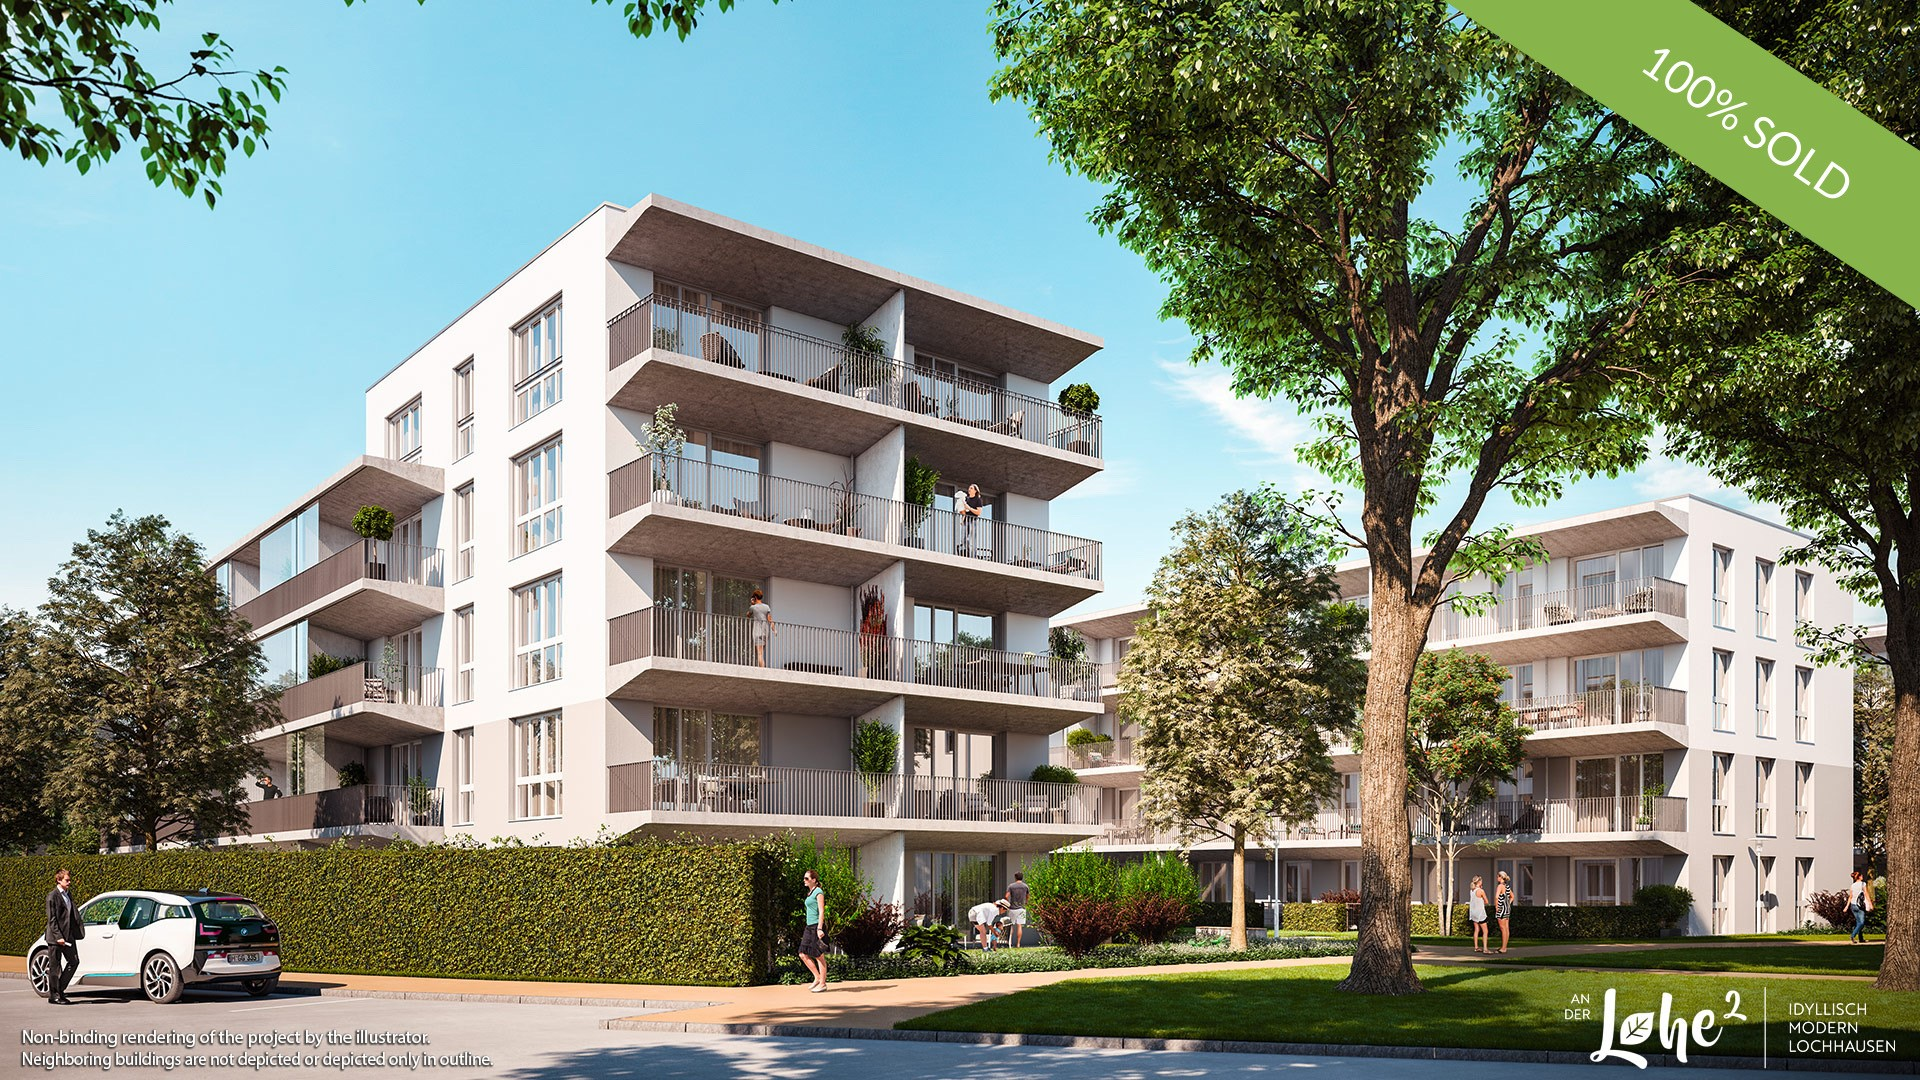 'AN DER LOHE 2' in Munich-Lochhausen: All condominiums are sold